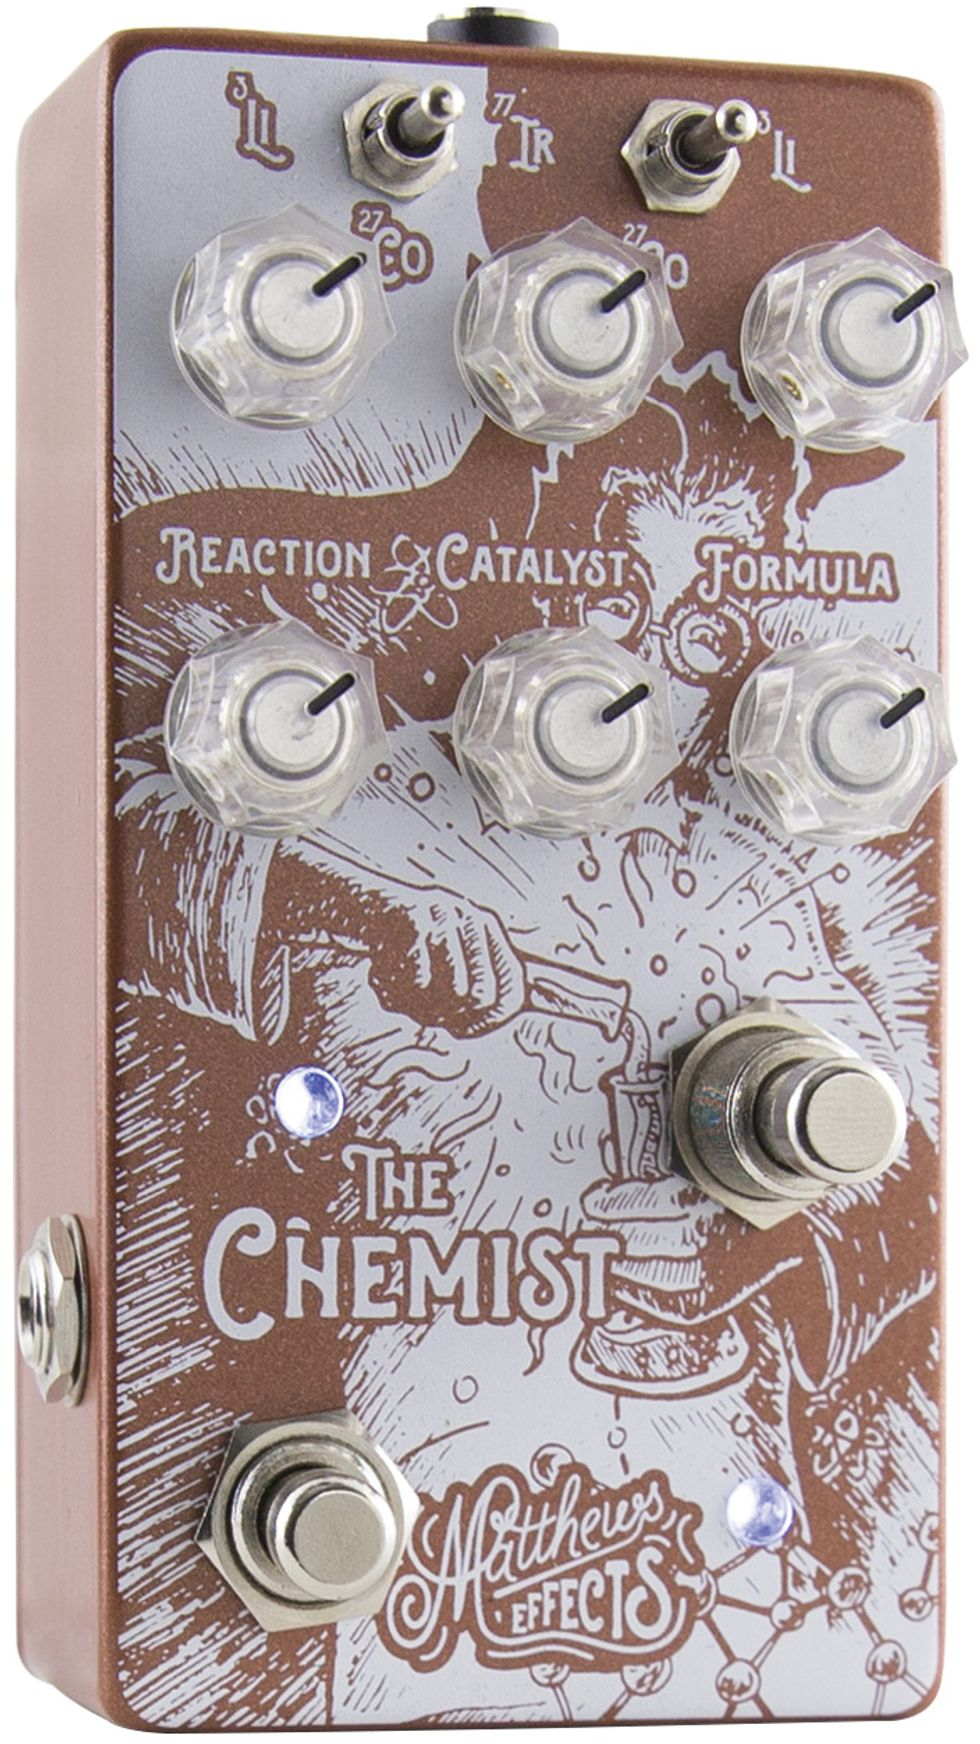 Matthews Effects The Chemist v1.5 Atomic Modulator Chorus Vibrato Phaser Octave